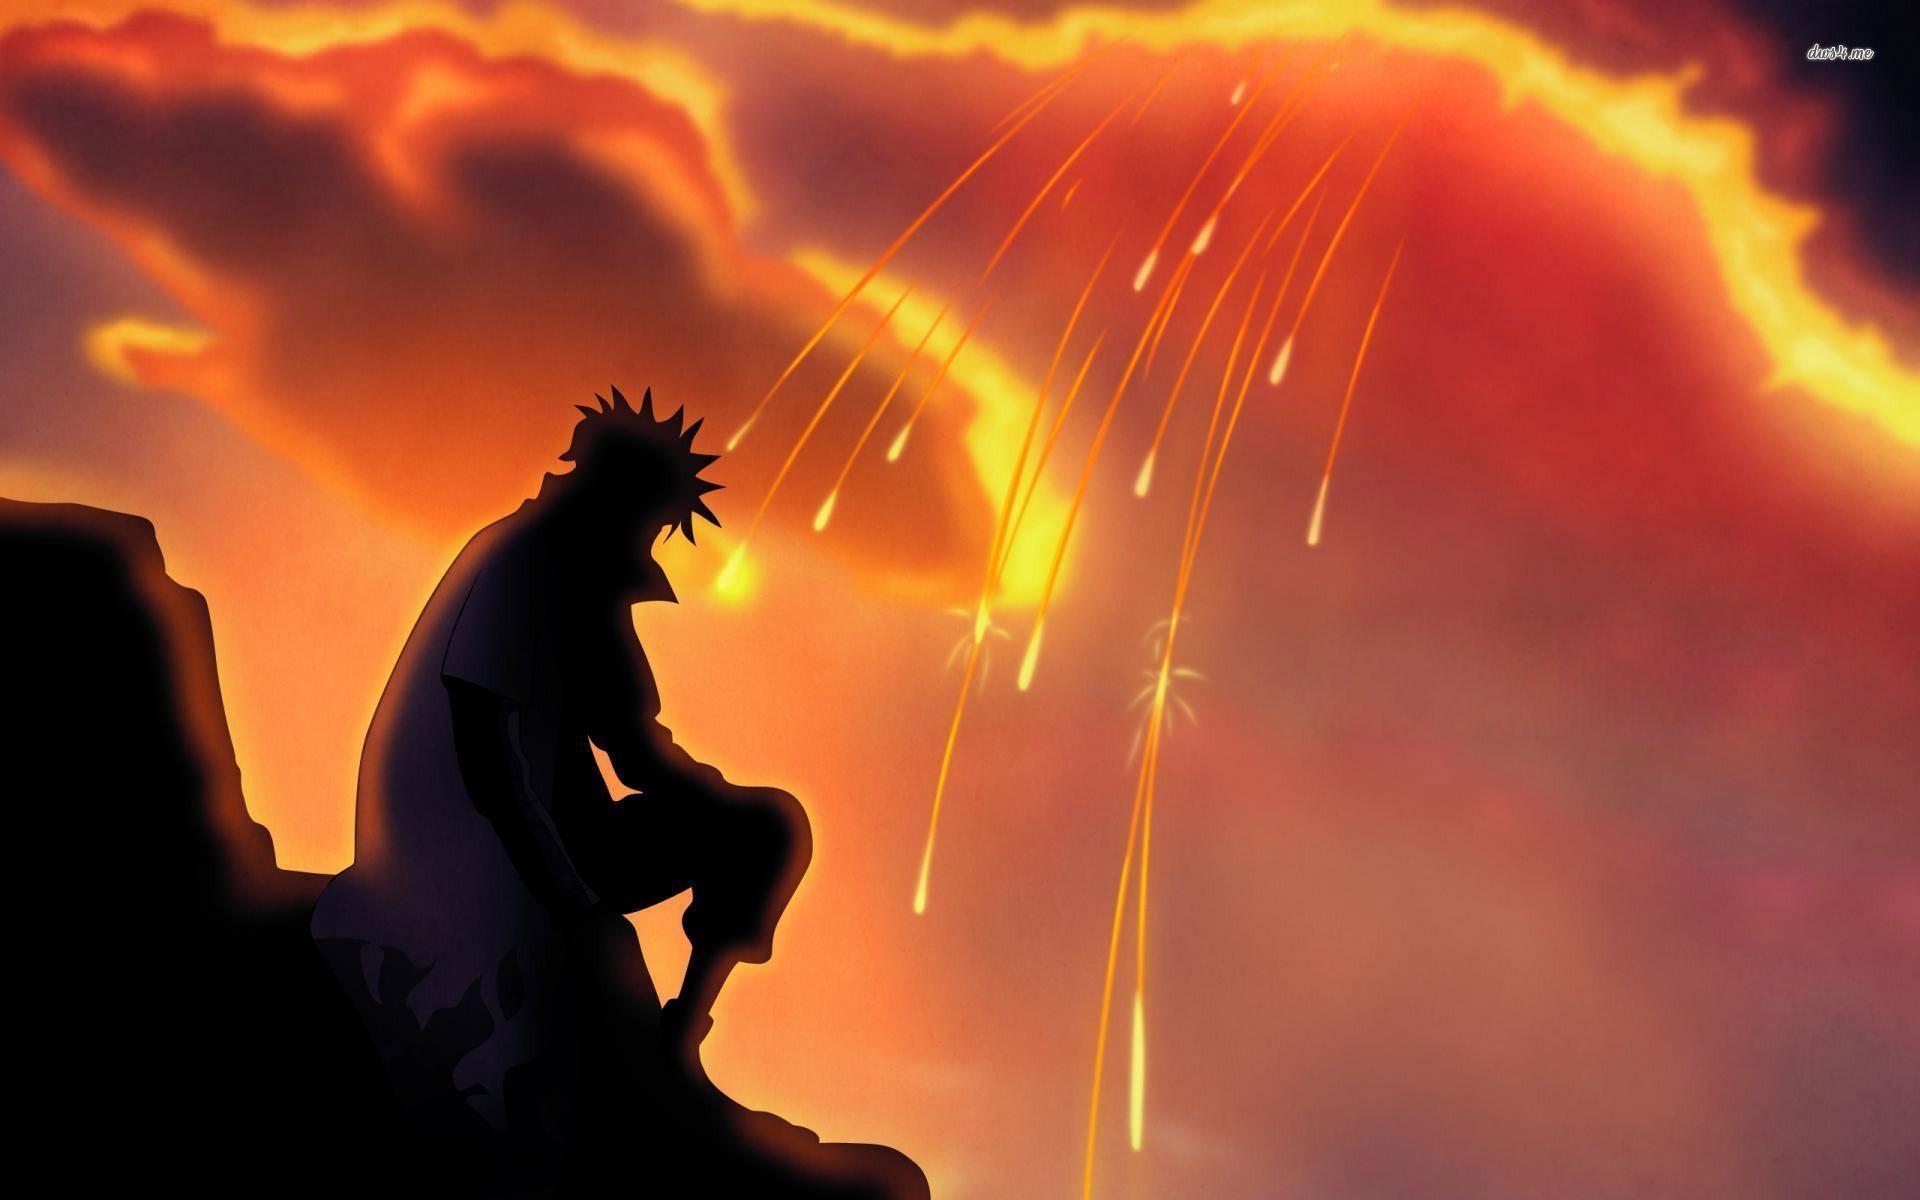 Download 770 Koleksi Wallpaper Naruto And Minato Terbaik